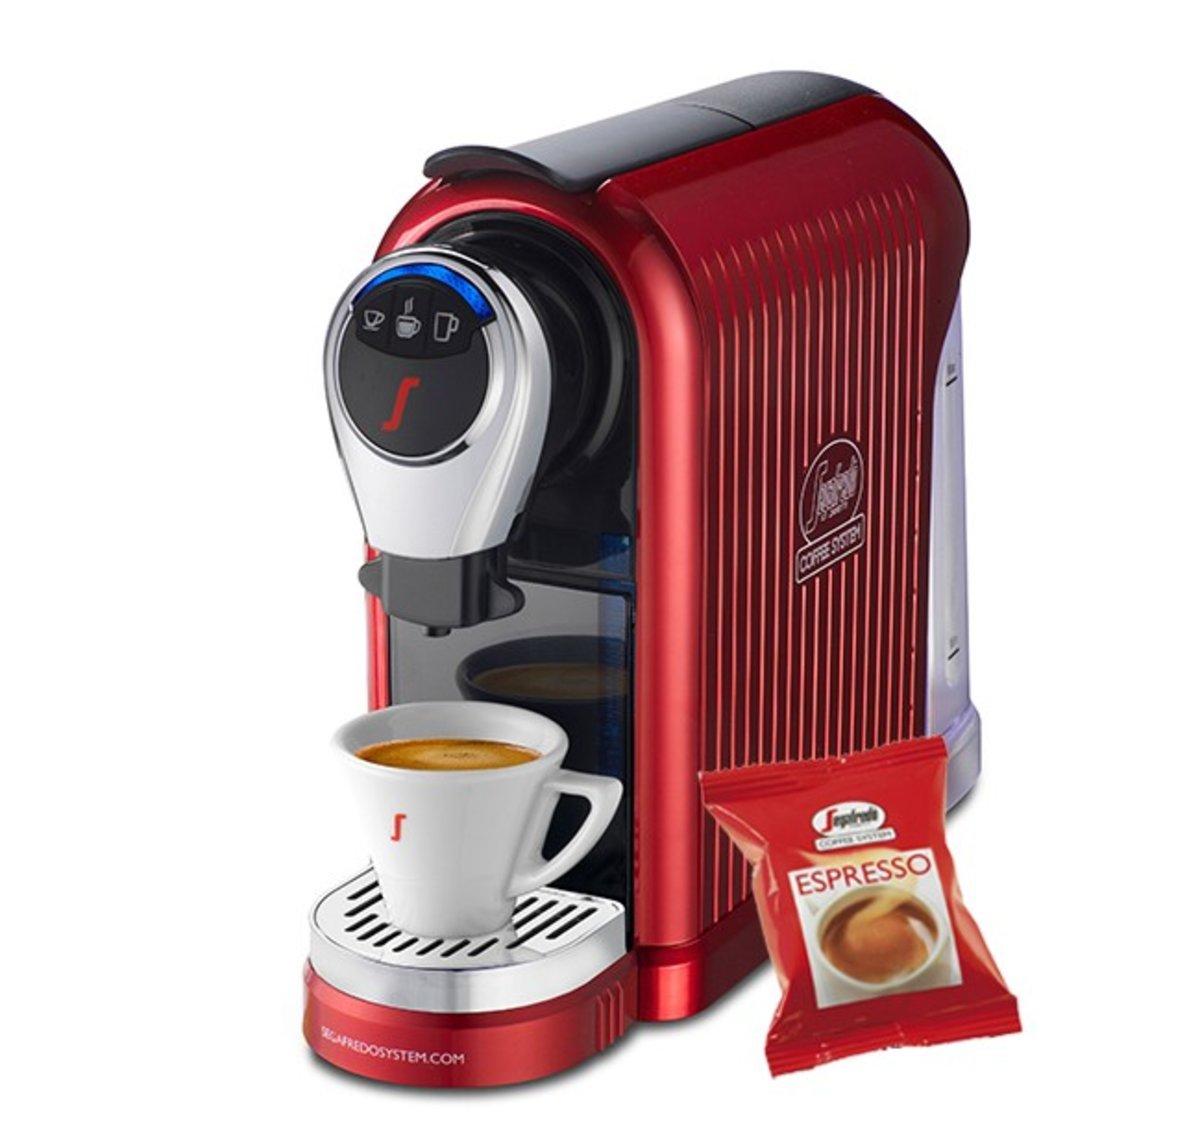 [100 Free Capsules] Espresso 1 Plus Coffee Capsule Machine (Glossy Red)